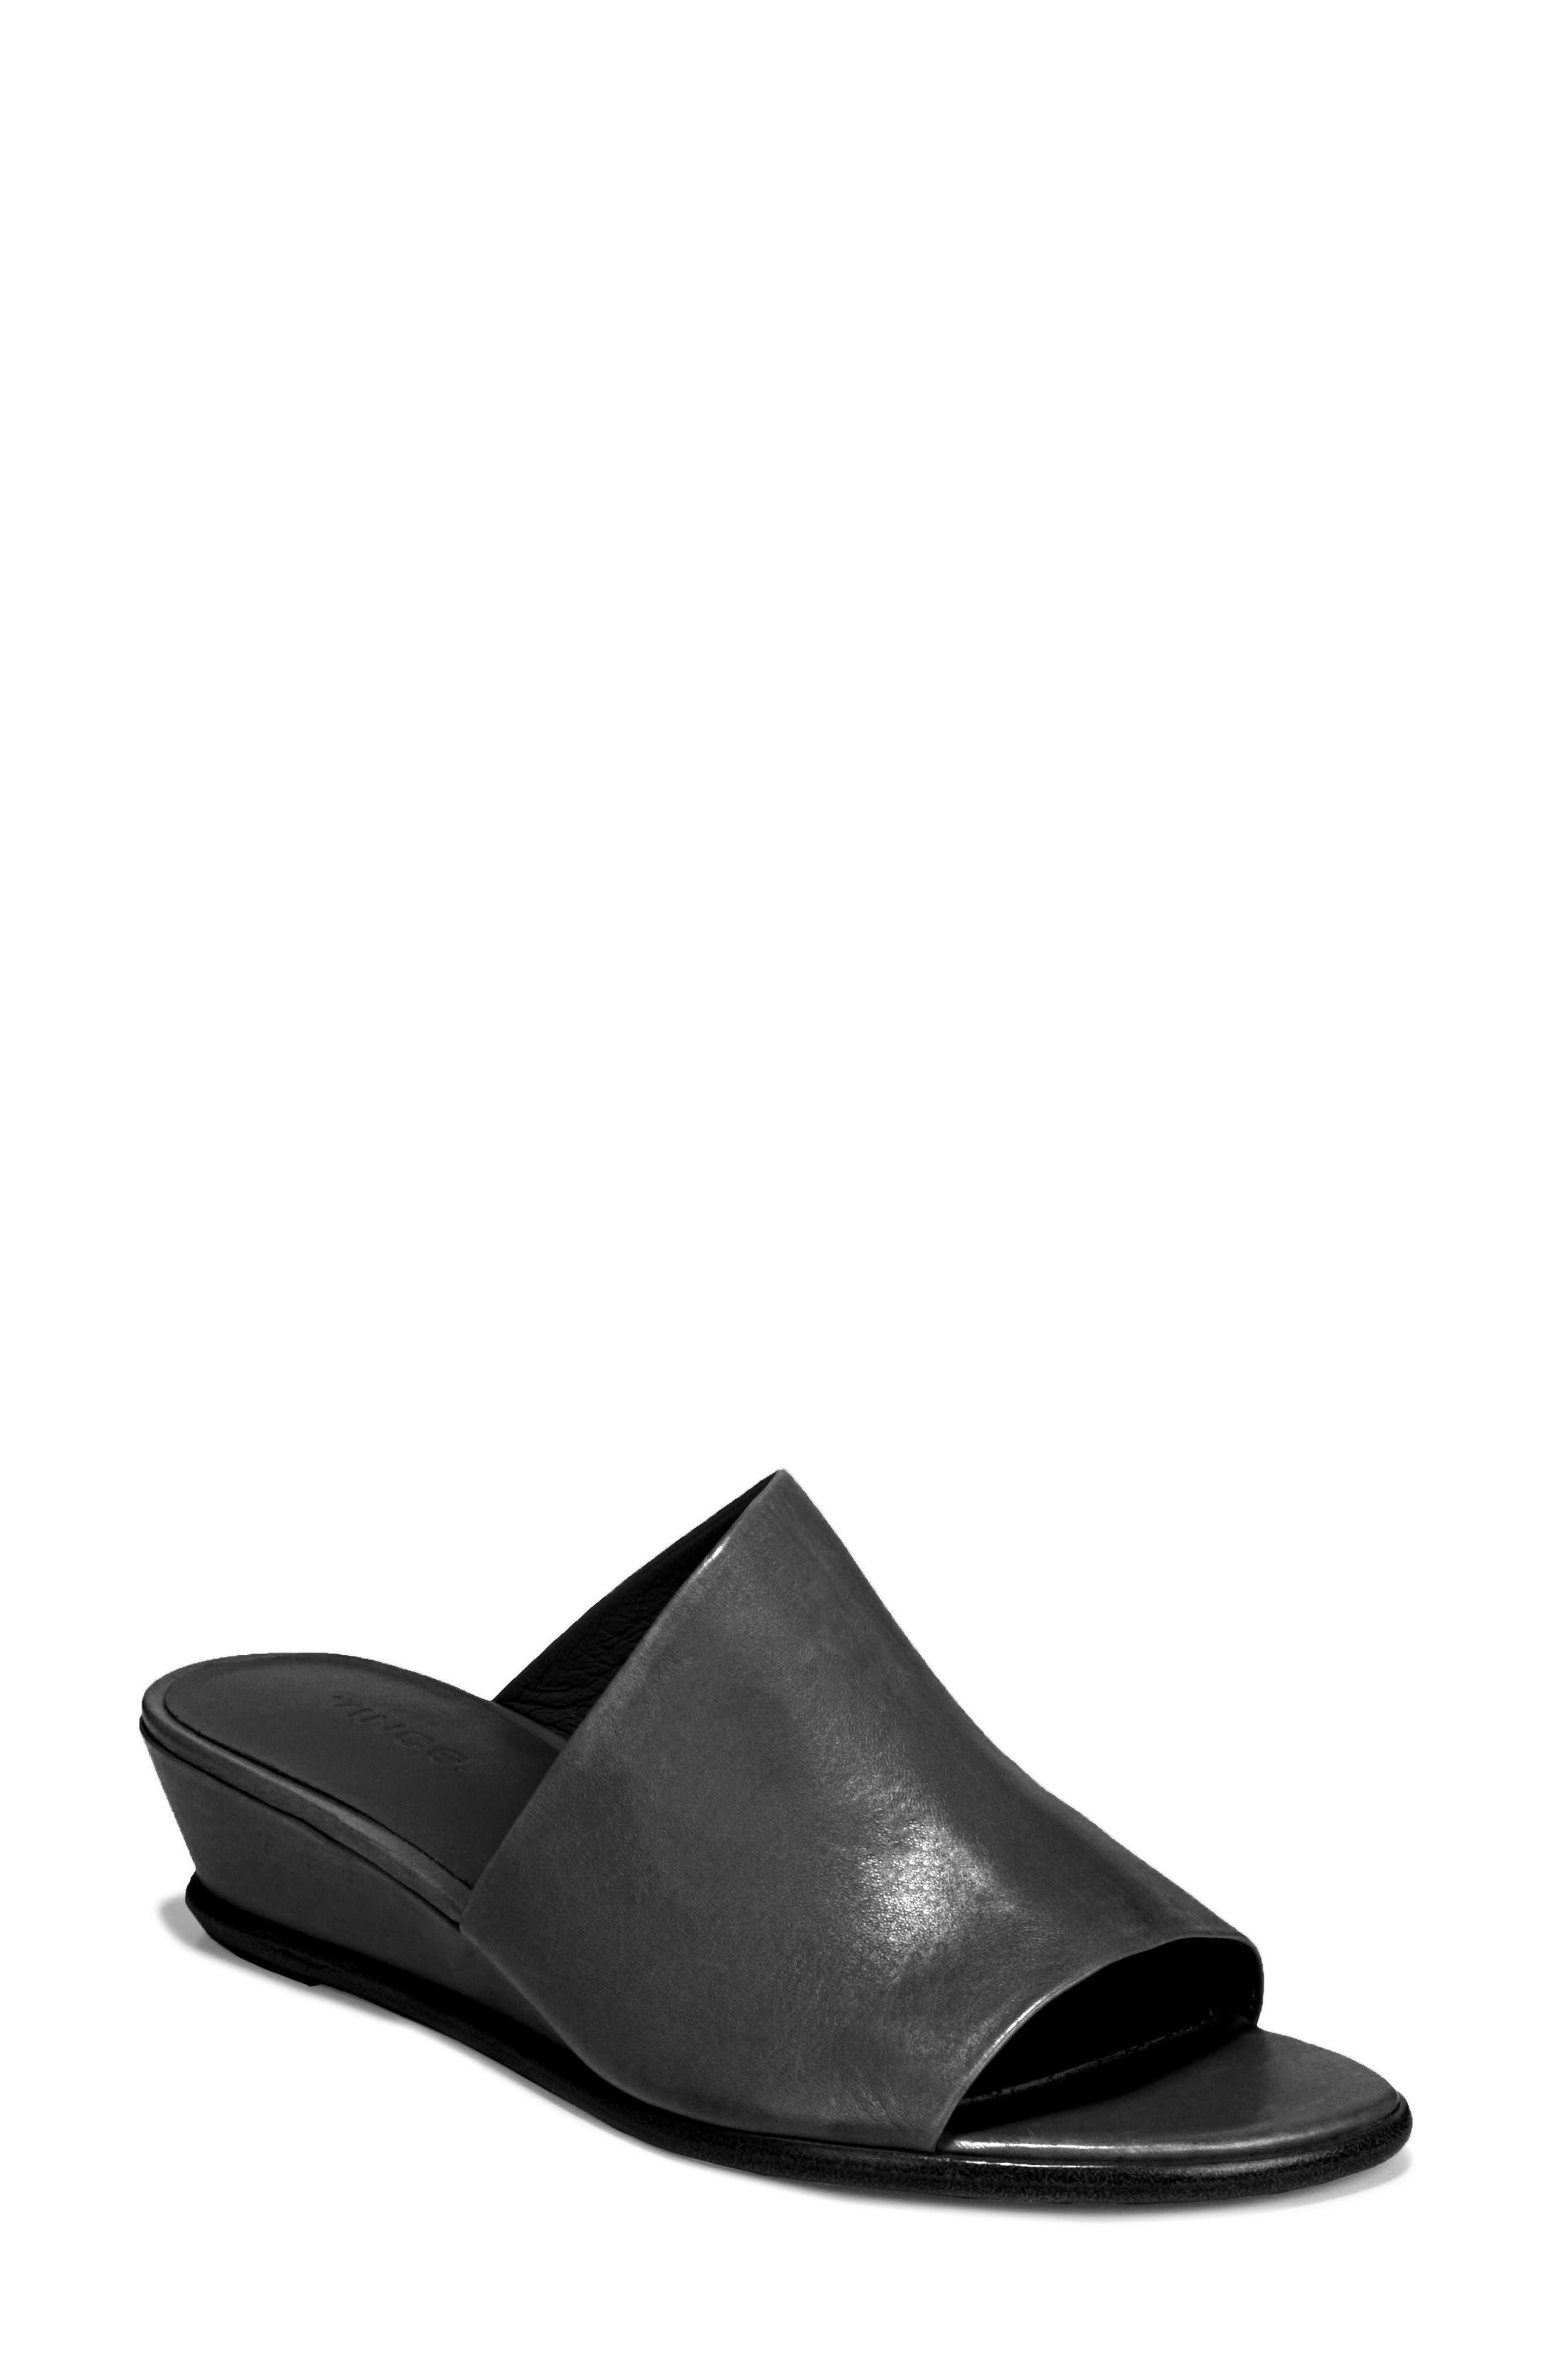 VINCE, Duvall Asymmetrical Wedge Sandal, Main thumbnail 1, color, BLACK